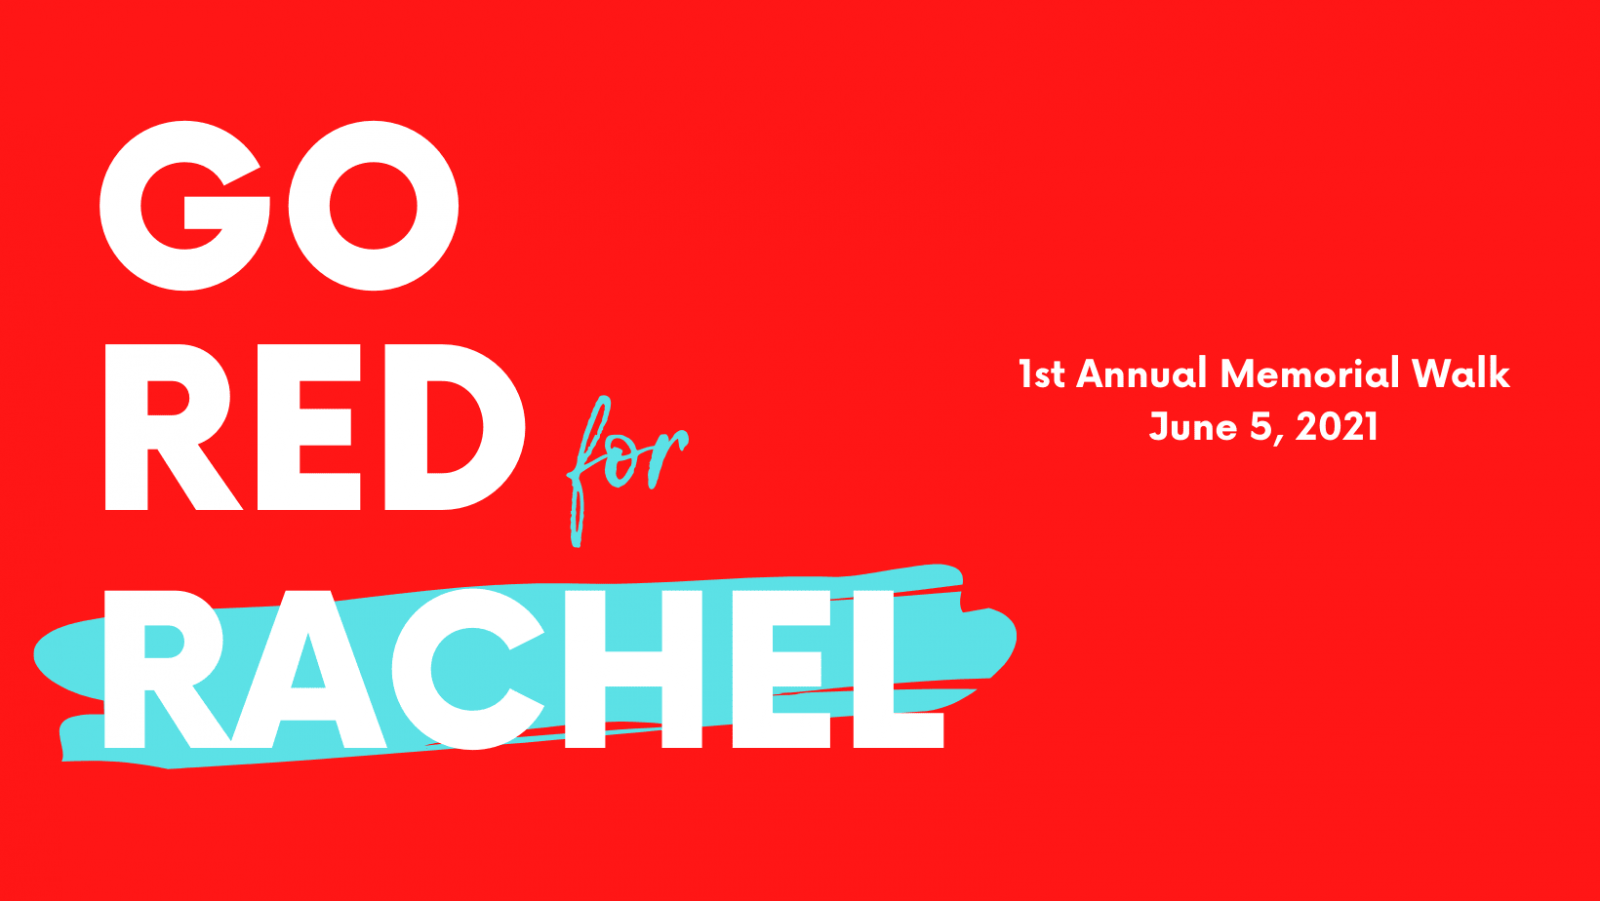 Go Red for Rachel